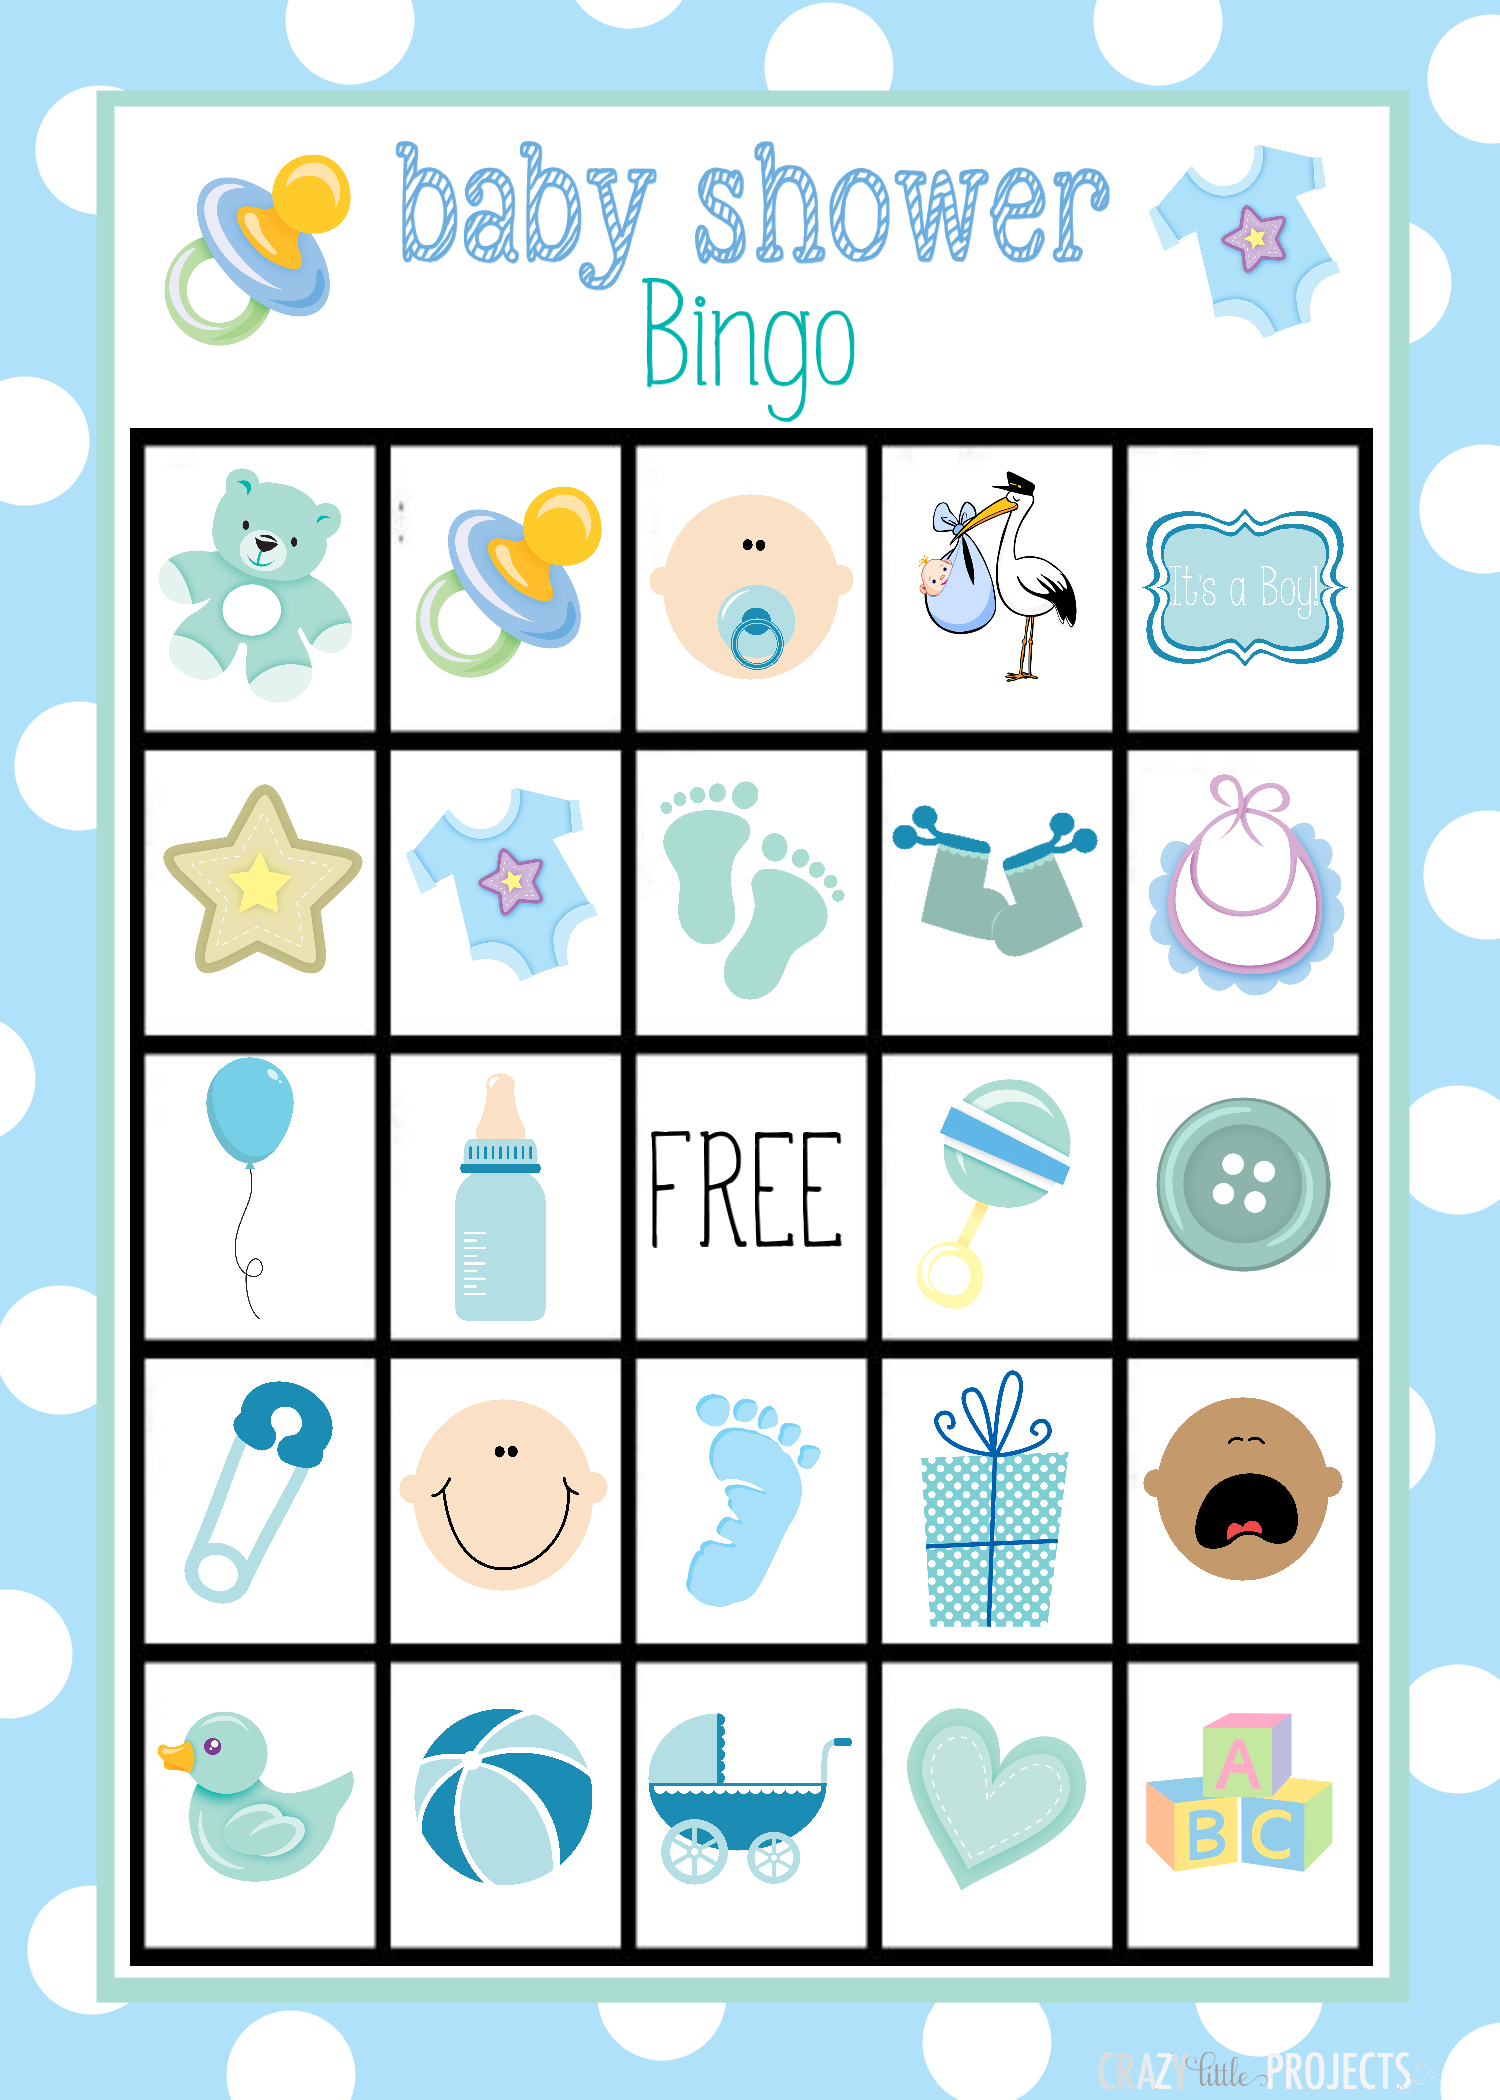 Baby Shower Bingo Cards - 50 Free Printable Baby Bingo Cards